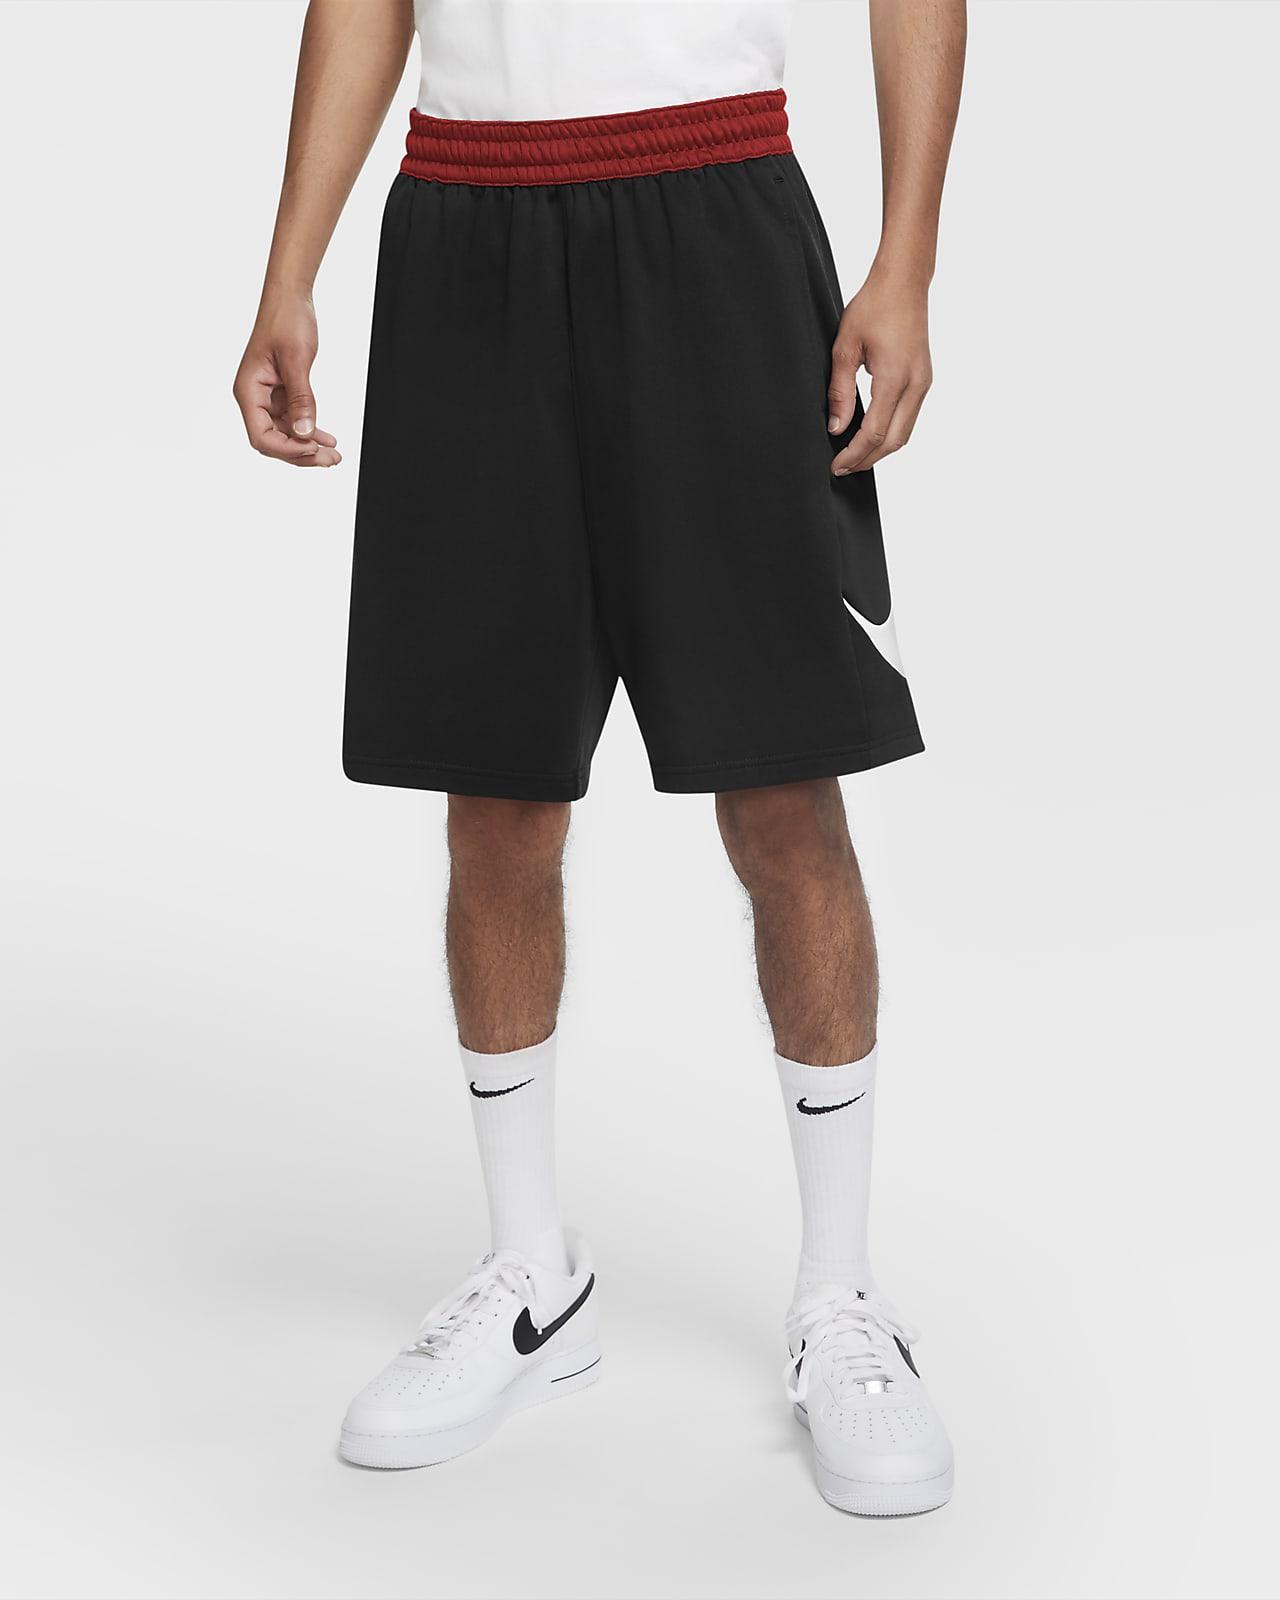 Nike Men's Fleece Basketball Shorts